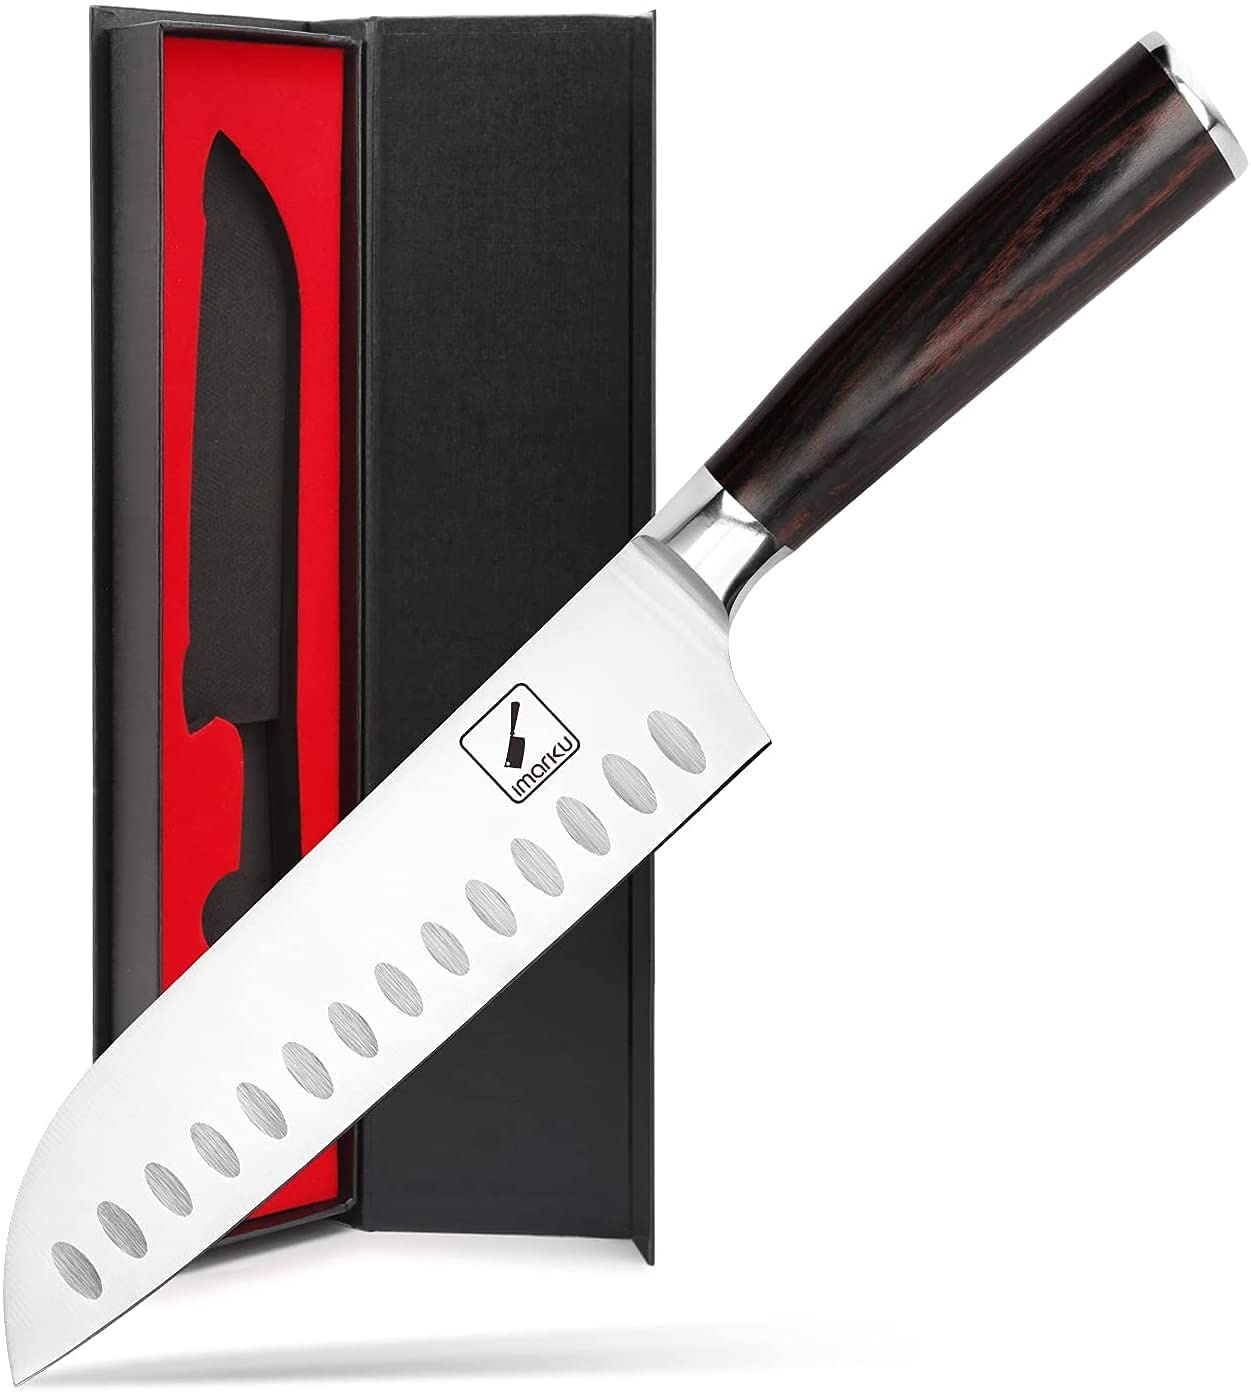 10. Imarku Santoku Knife